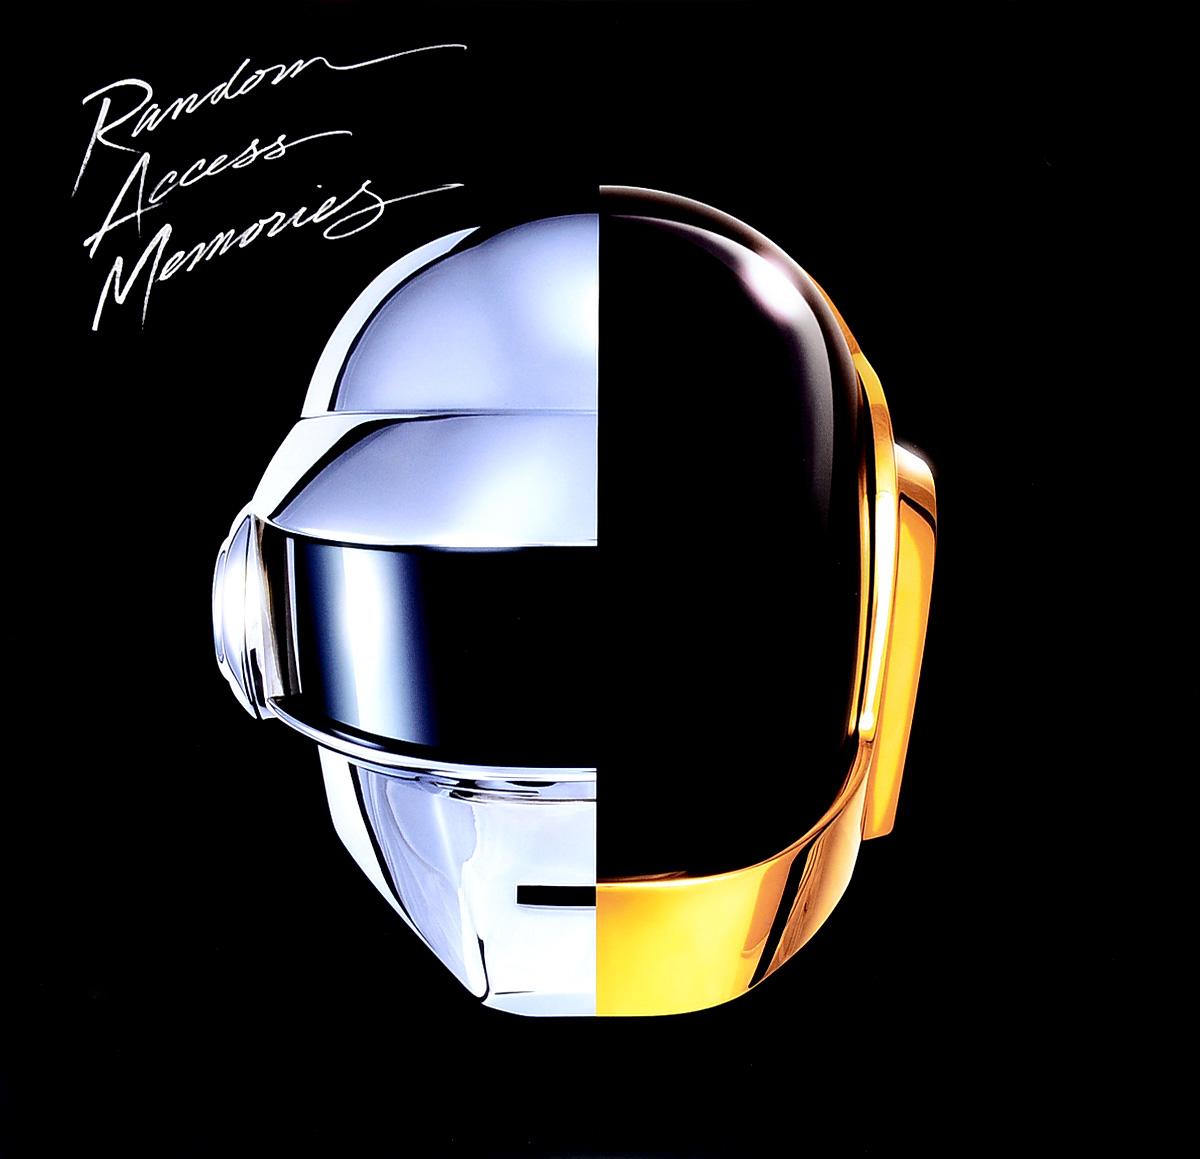 Daft Punk Daft Punk. Random Access Memories (2 LP) футболка wearcraft premium slim fit printio daft punk random access memories